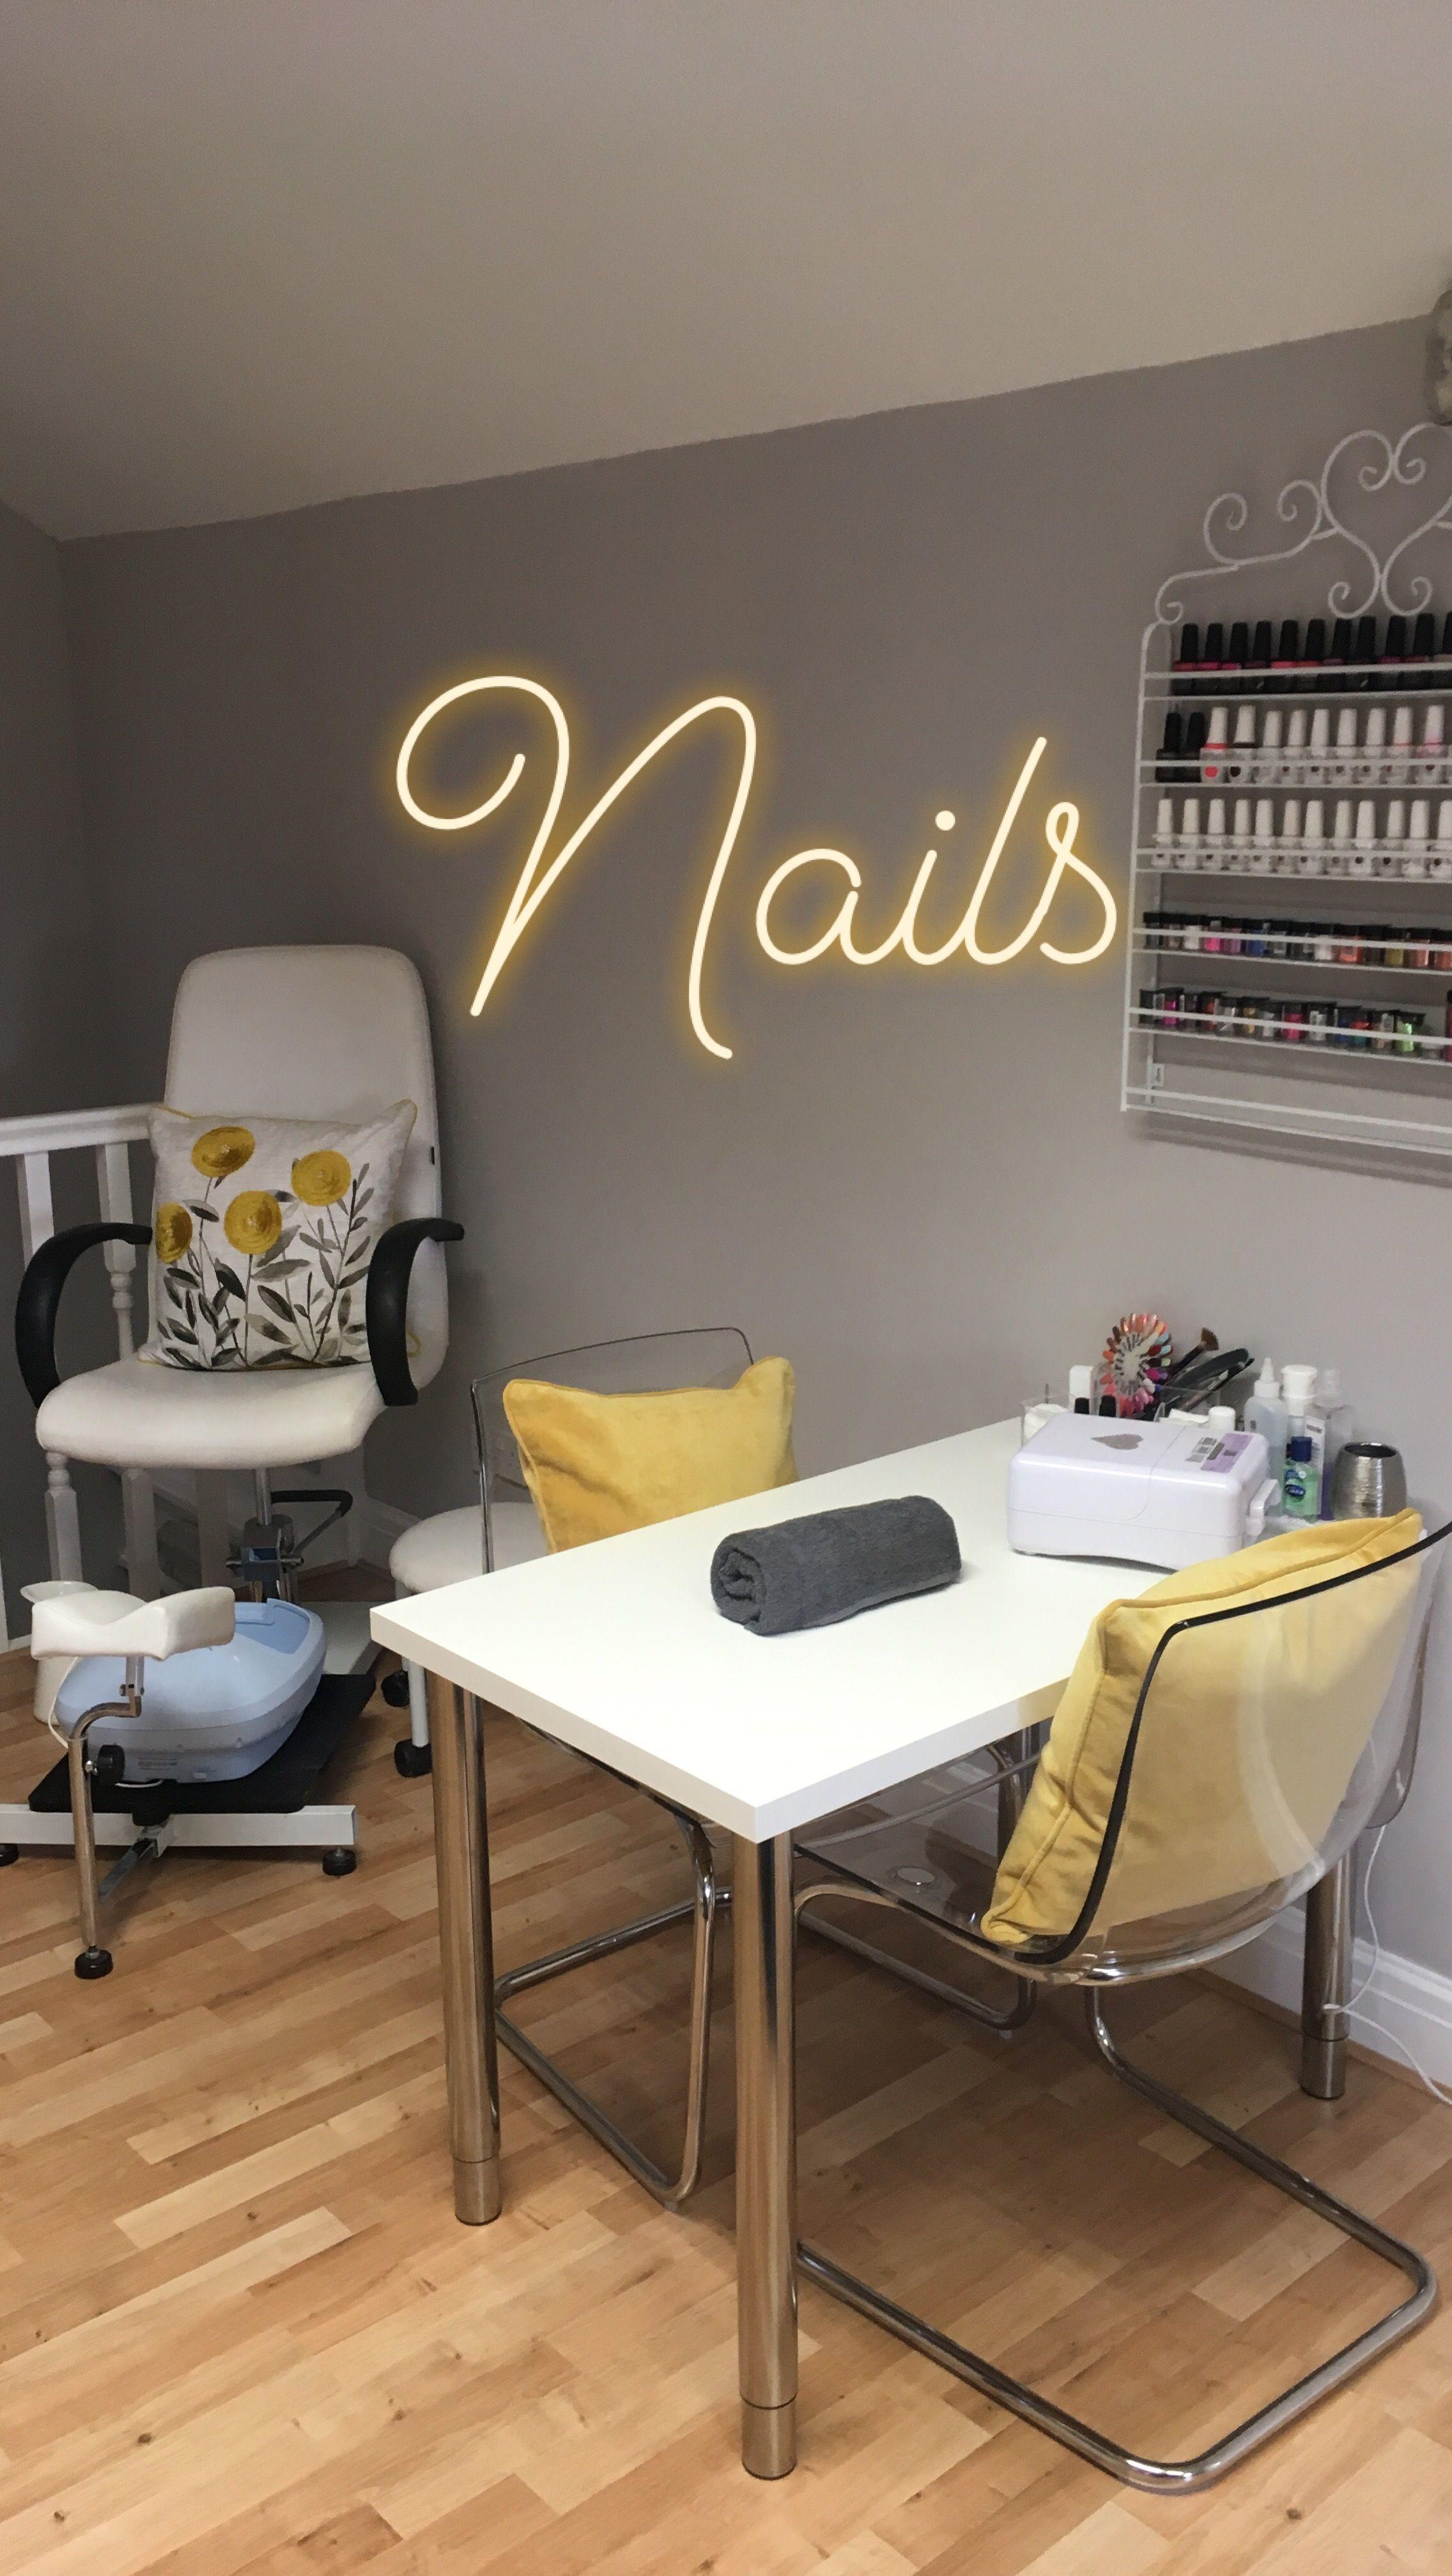 Lemon And Grey Nail And Pedicure Stations At My Salon Room Home Beauty Salon Beauty Salon Decor Home Nail Salon